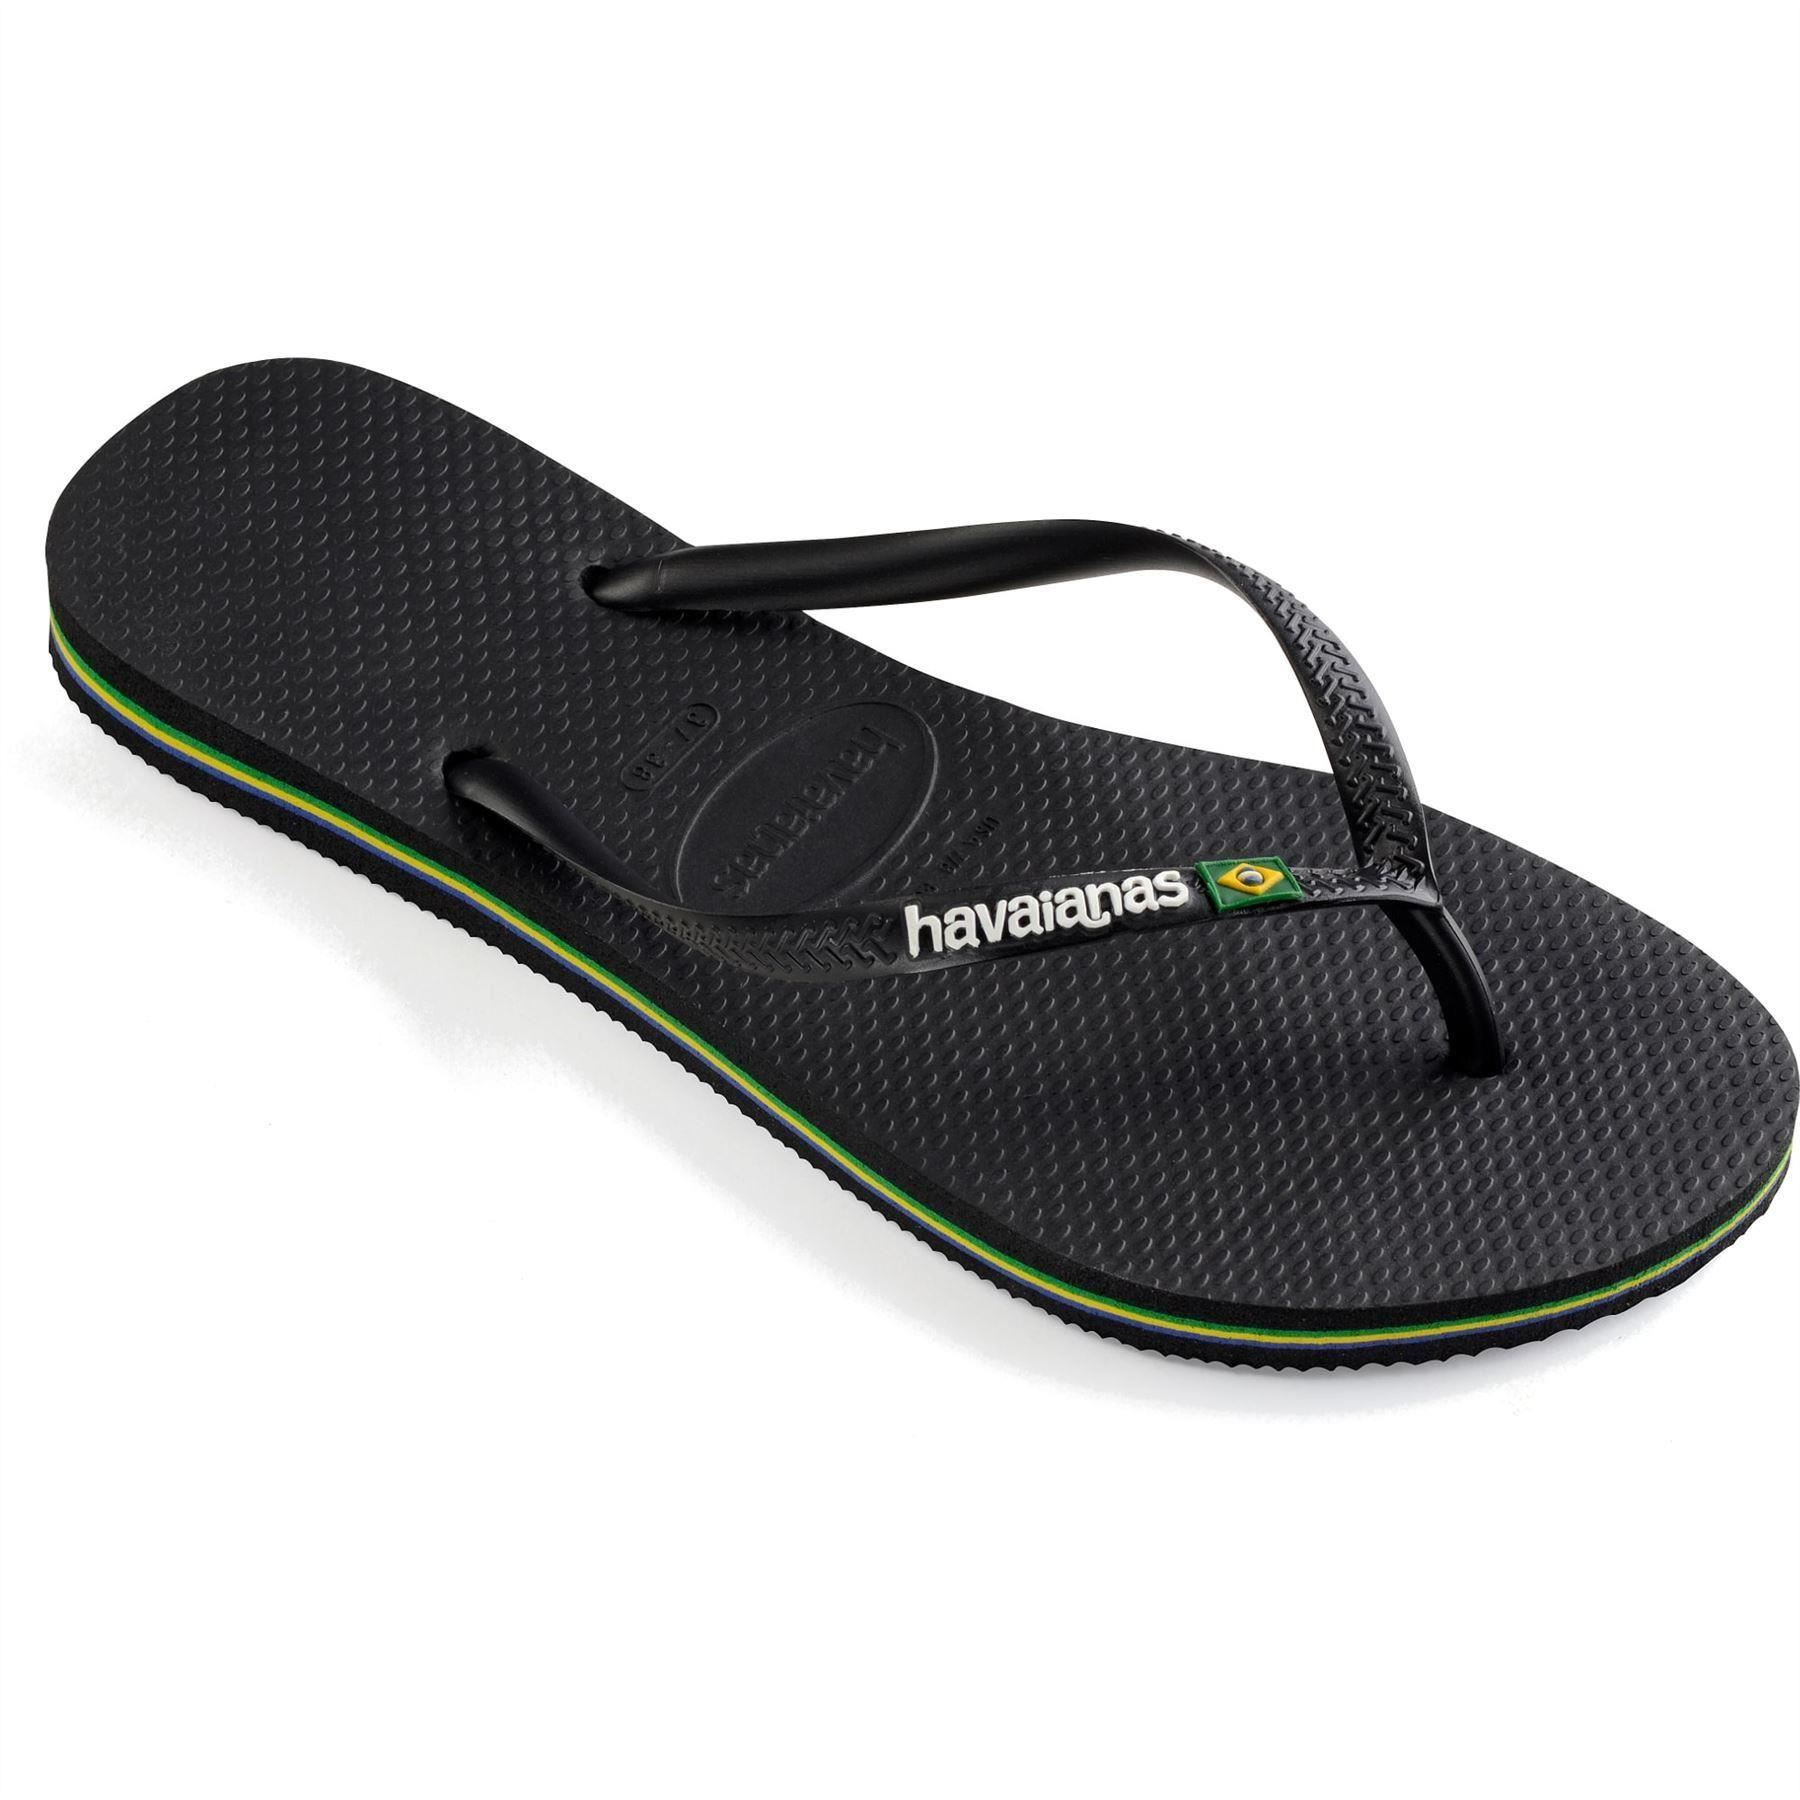 1cd892da8fc5 Havaianas Brasil Logo Men s Youth Flip Flops Sandals Vary Size ...